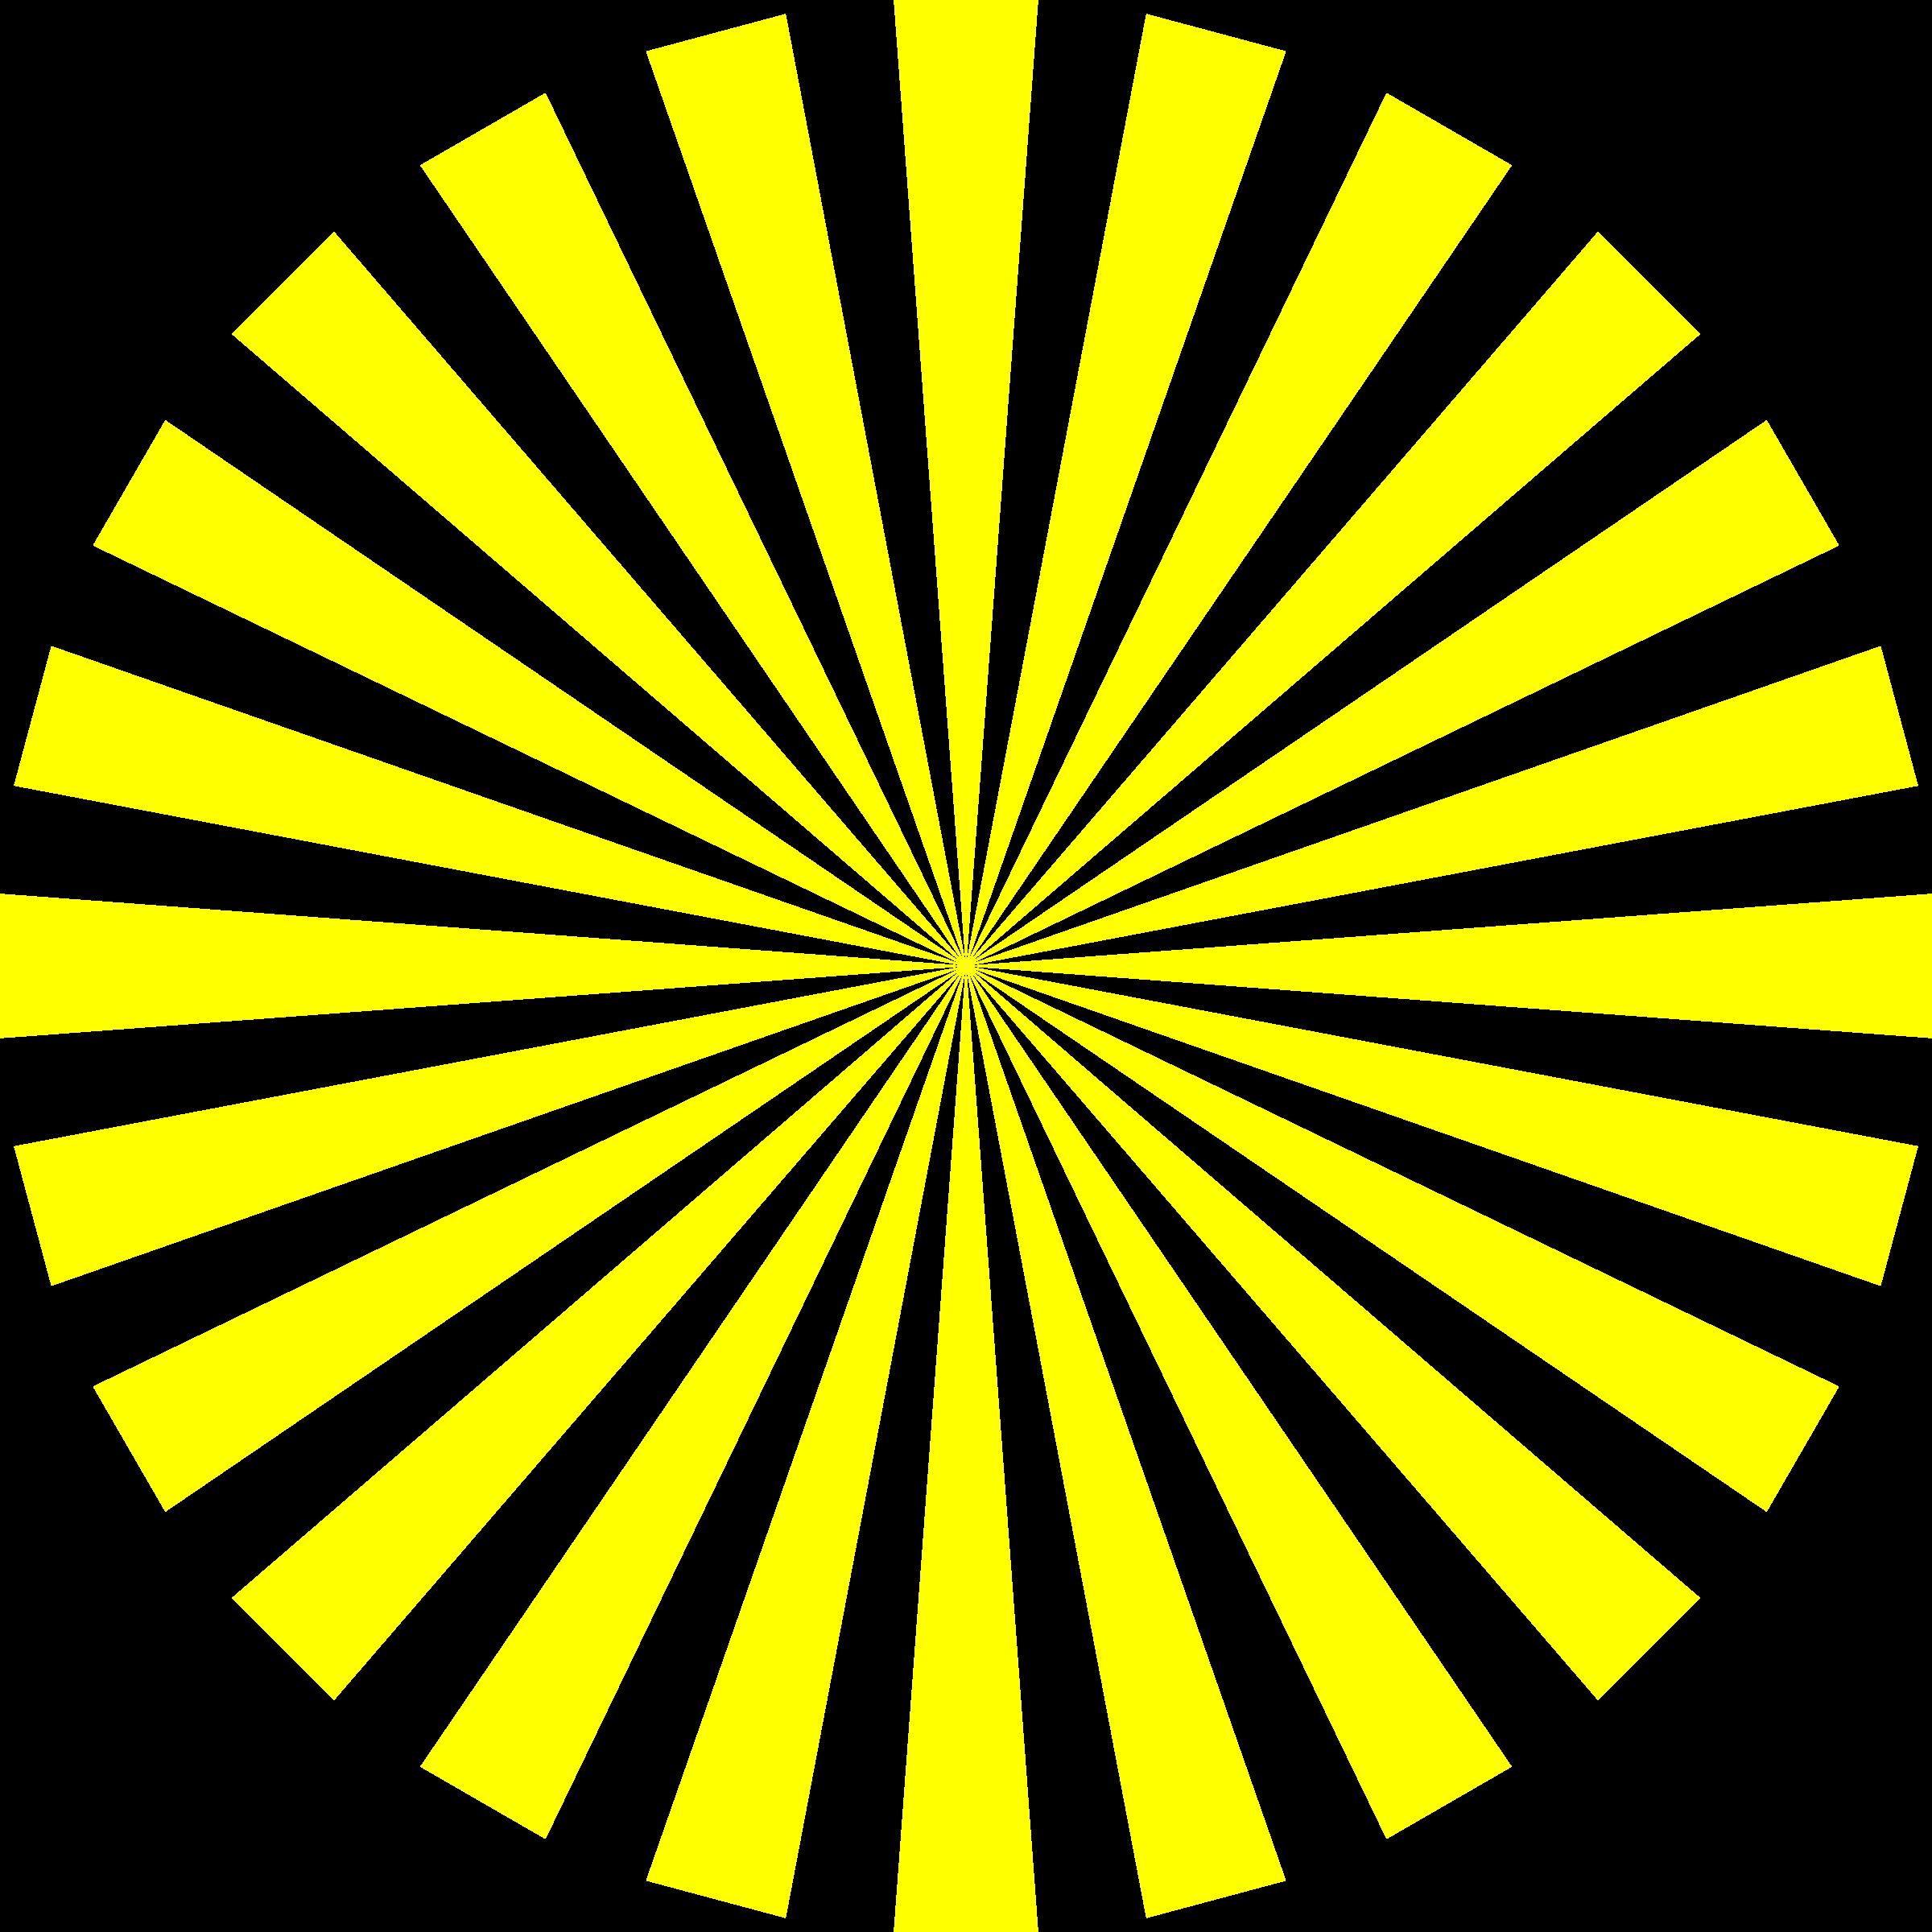 clipart transparent stock Basic yellow big image. Burst clipart design star